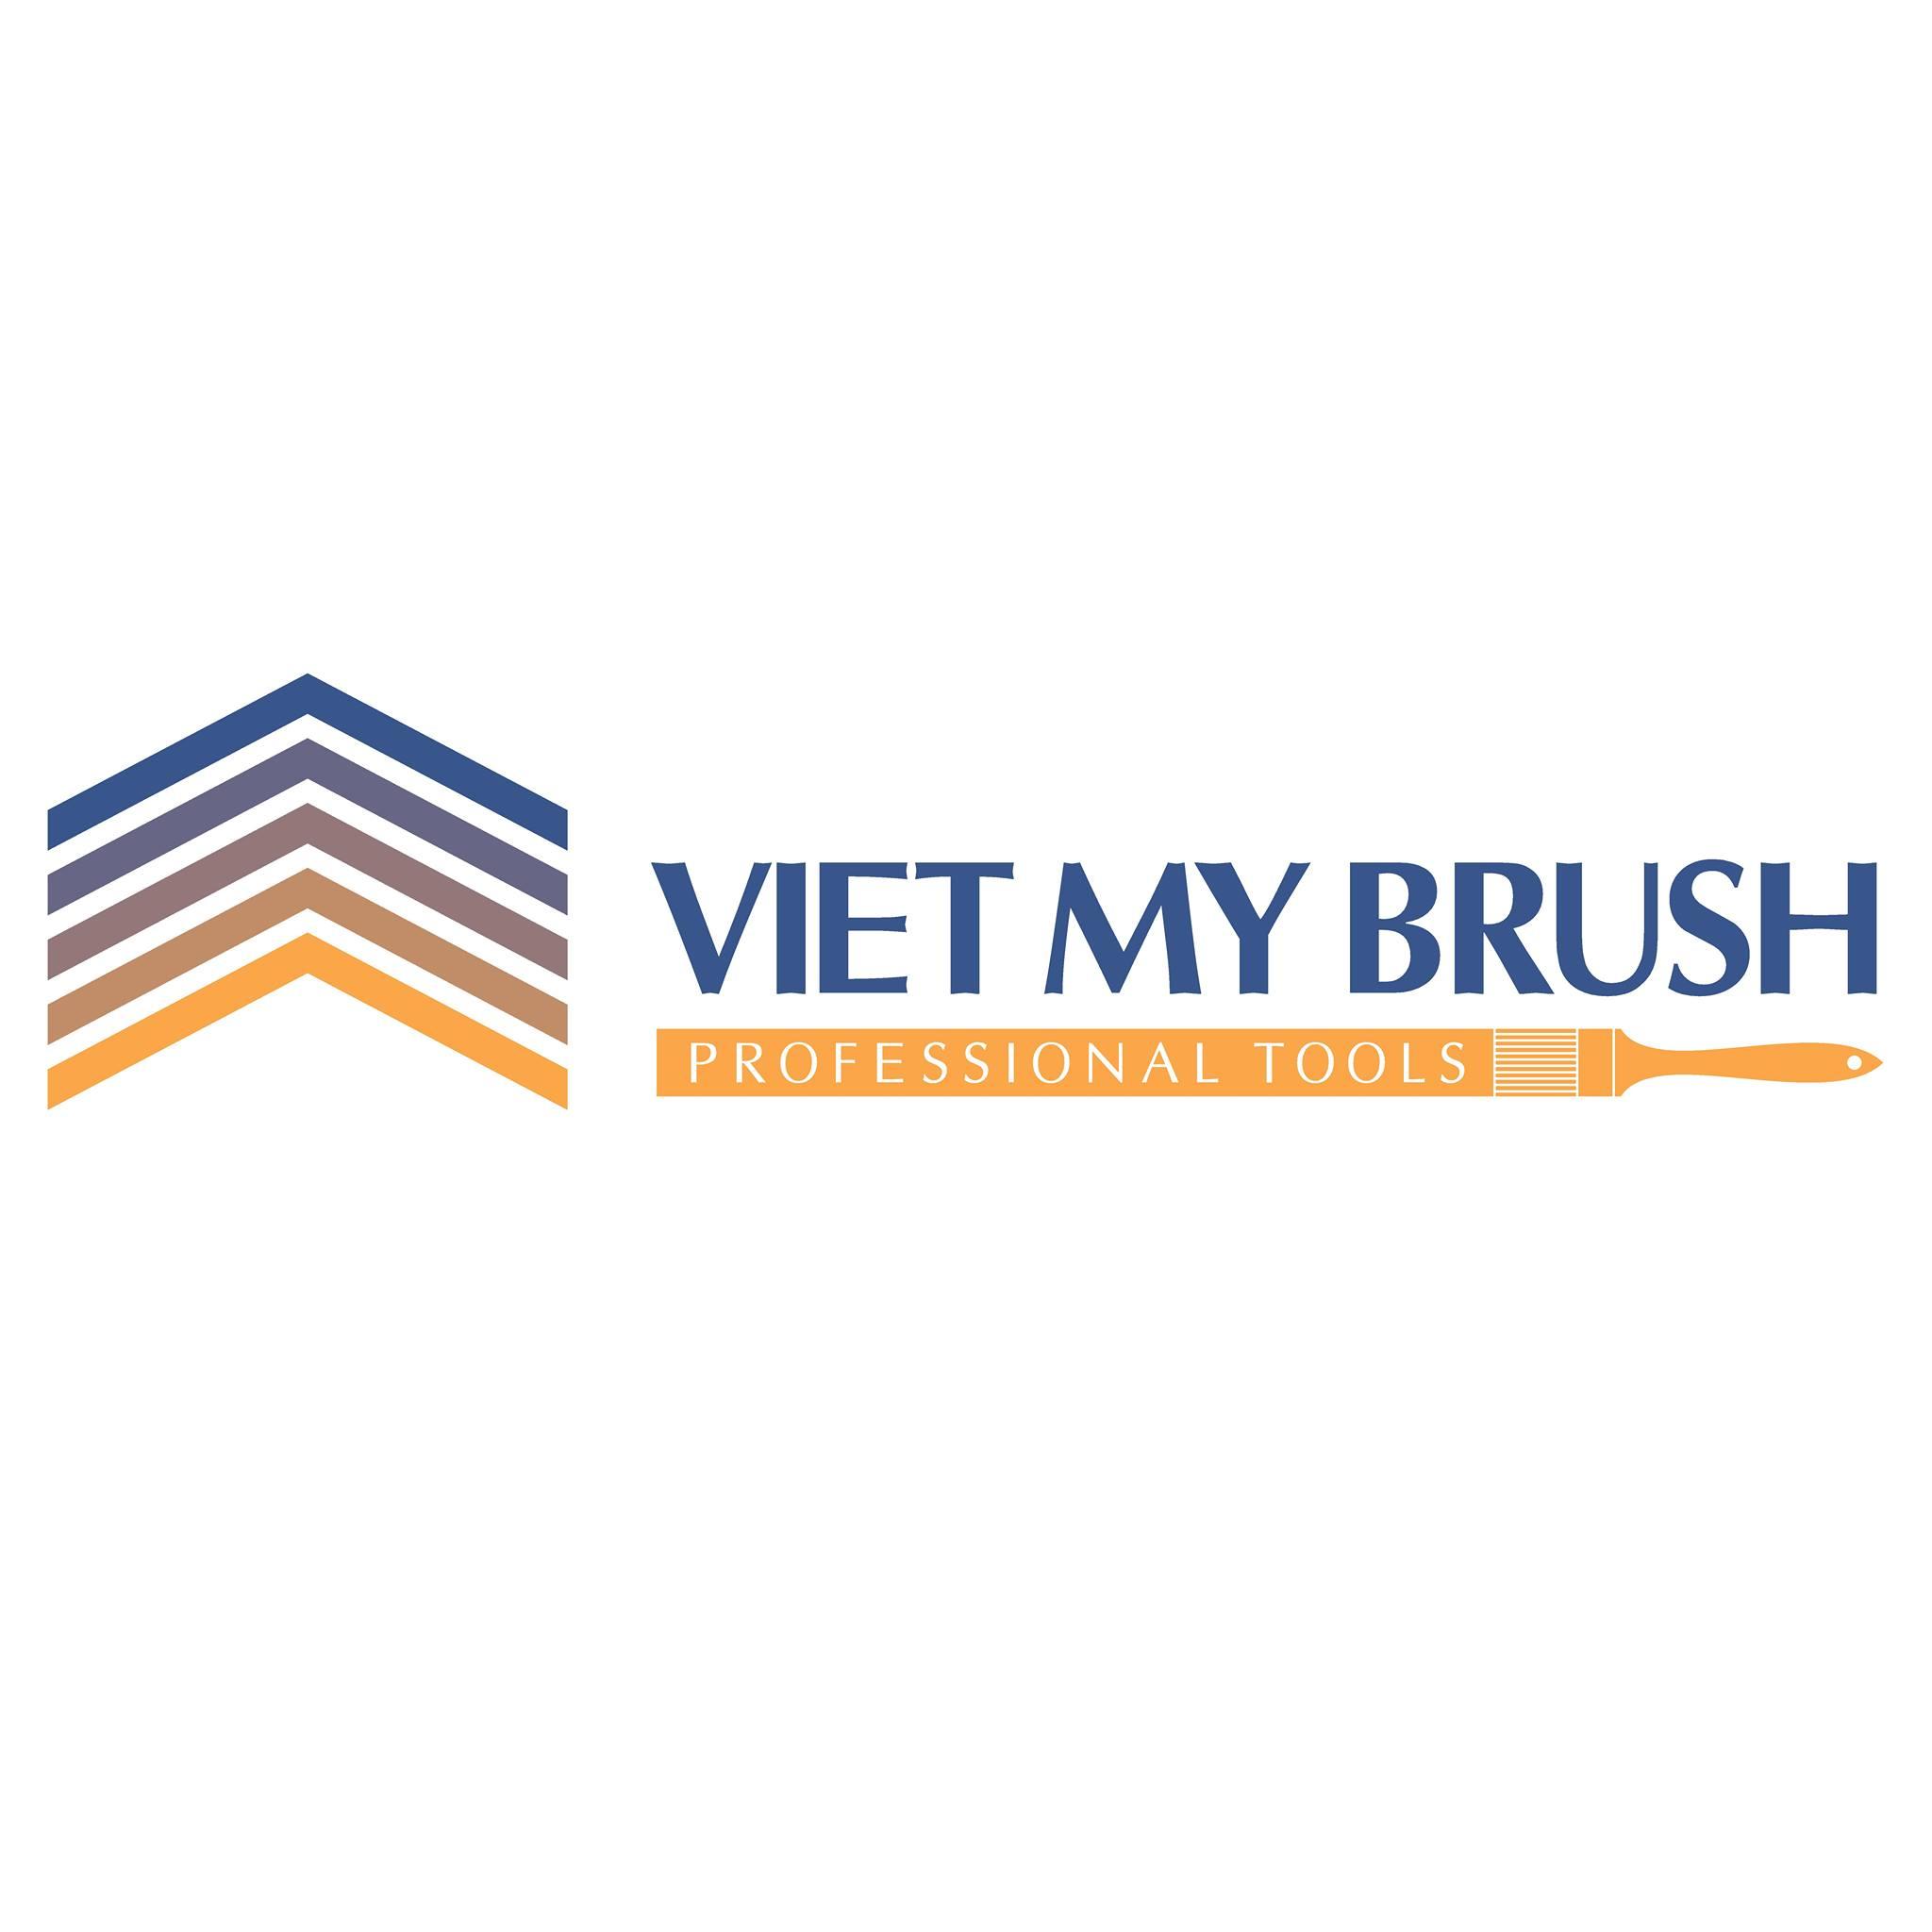 Vietmybrush